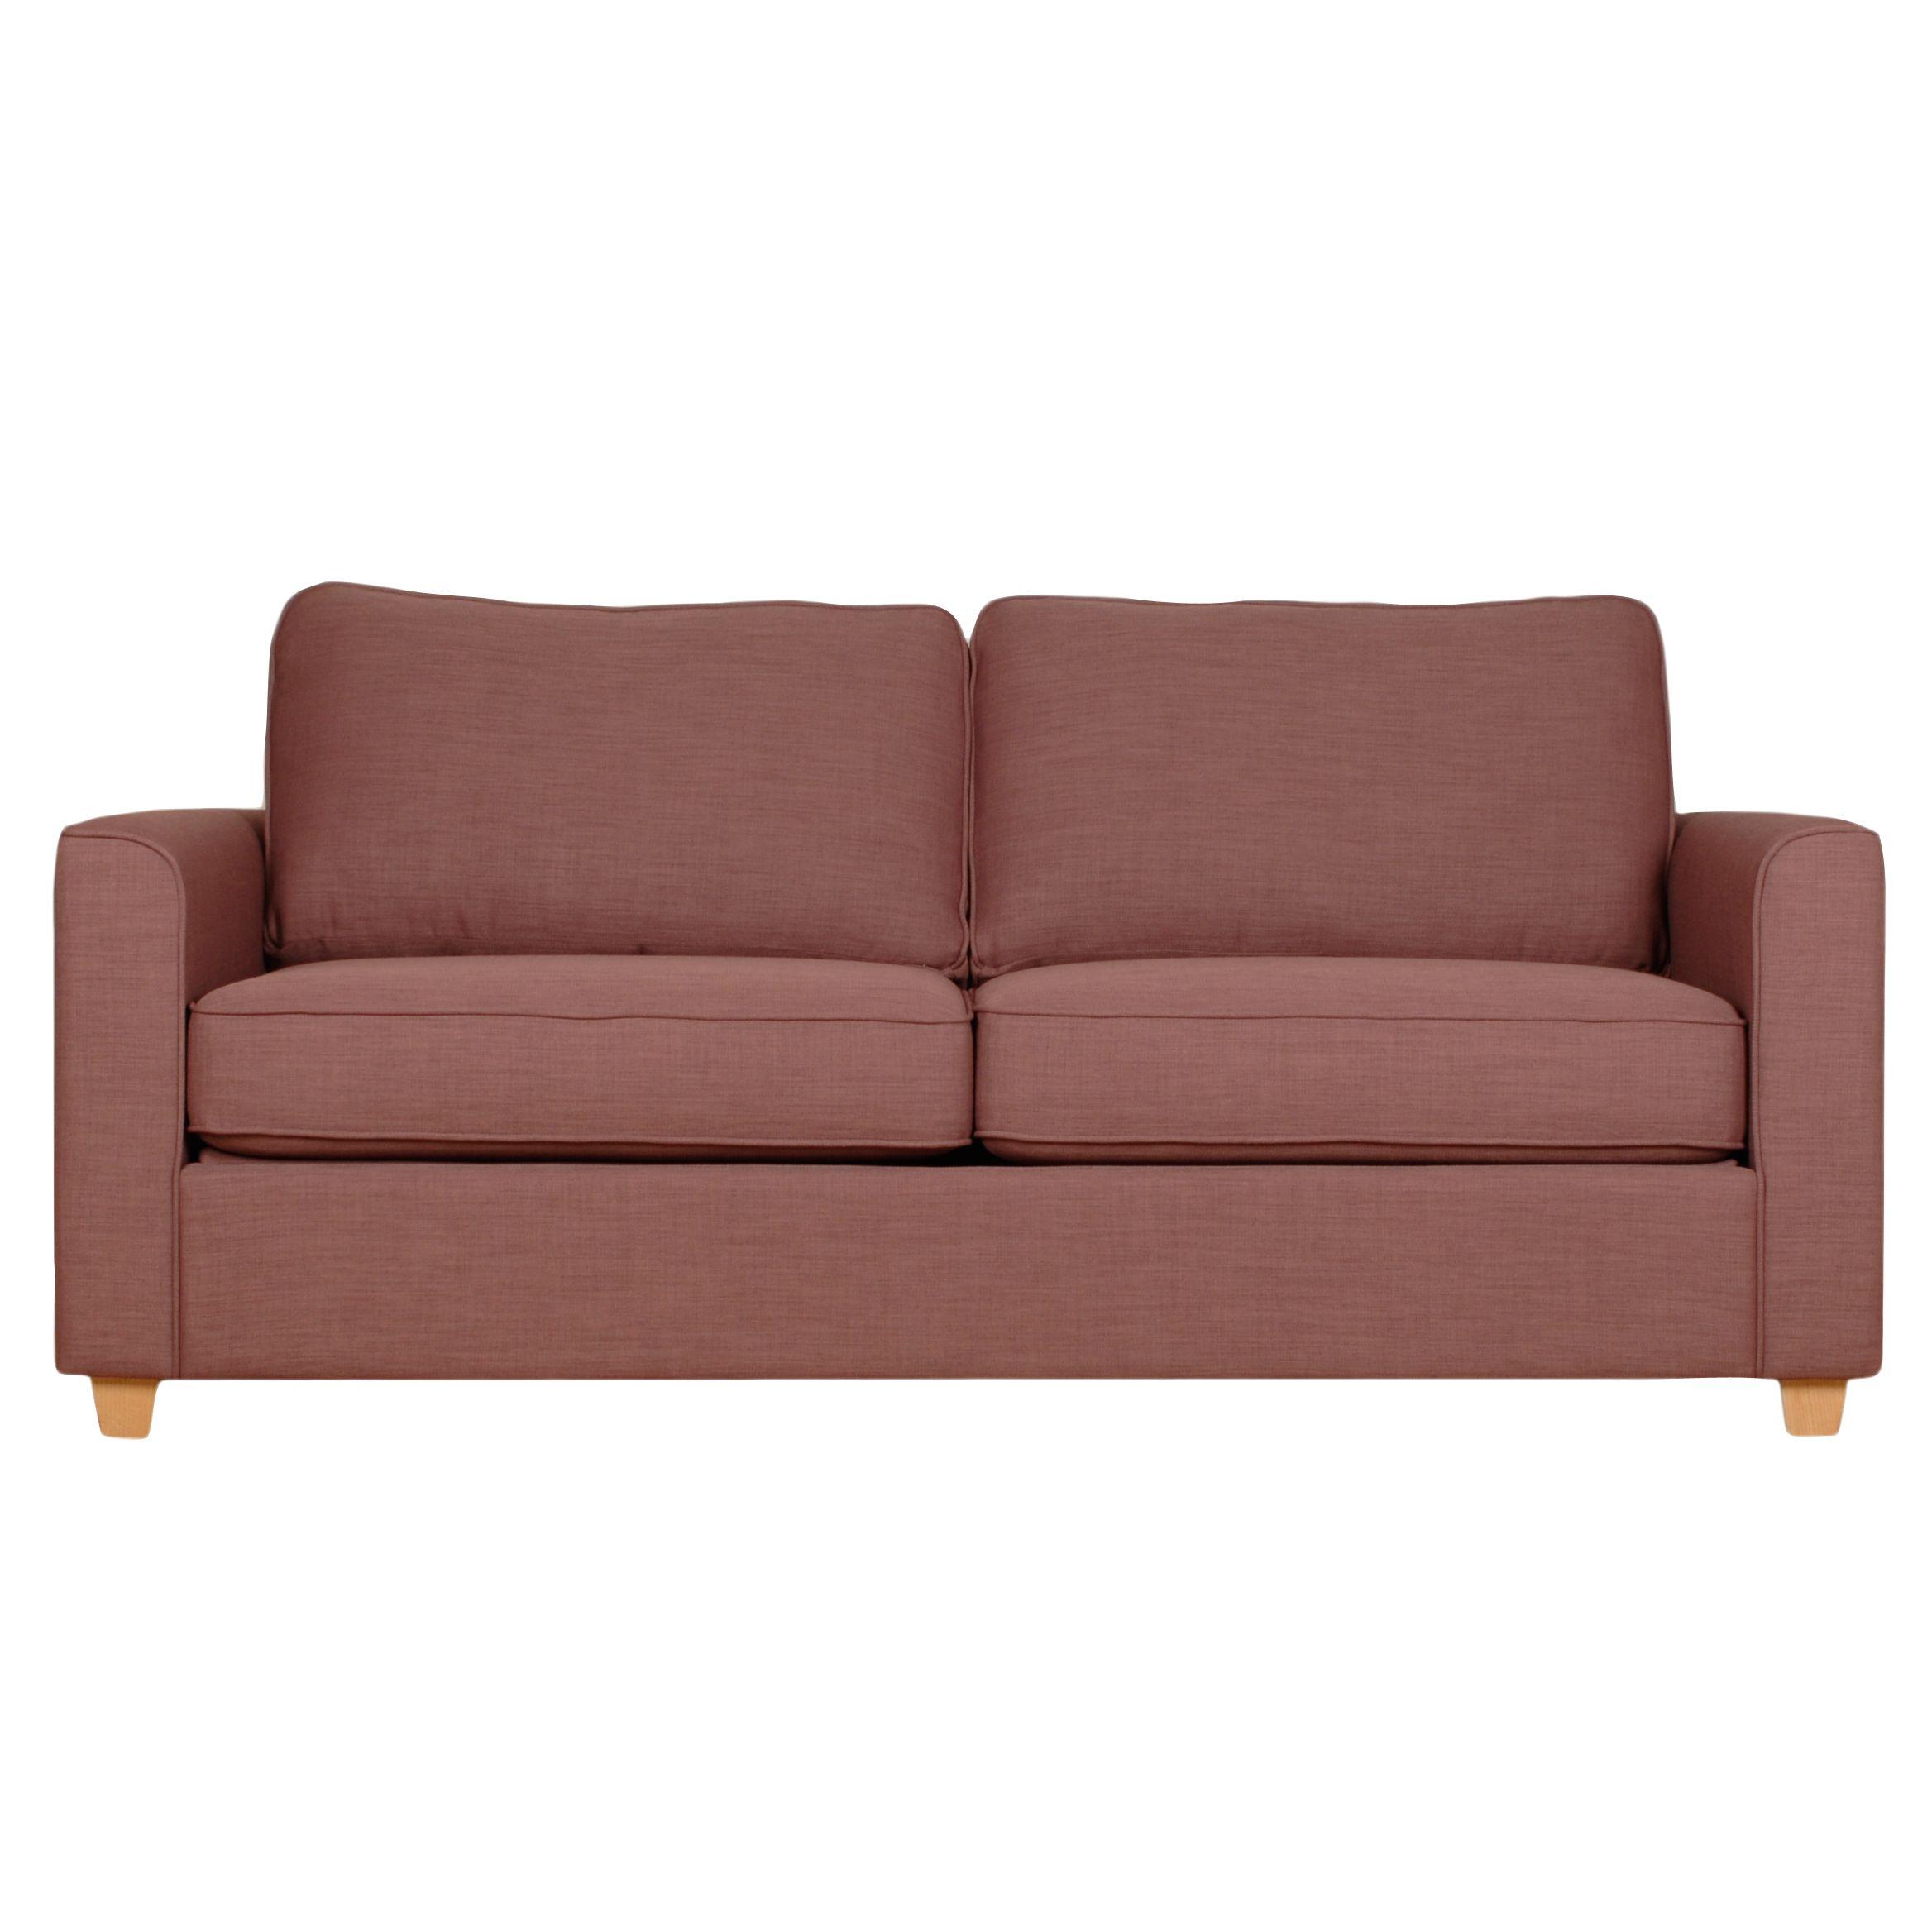 medium sofa bed tov furniture camden linen john lewis beds